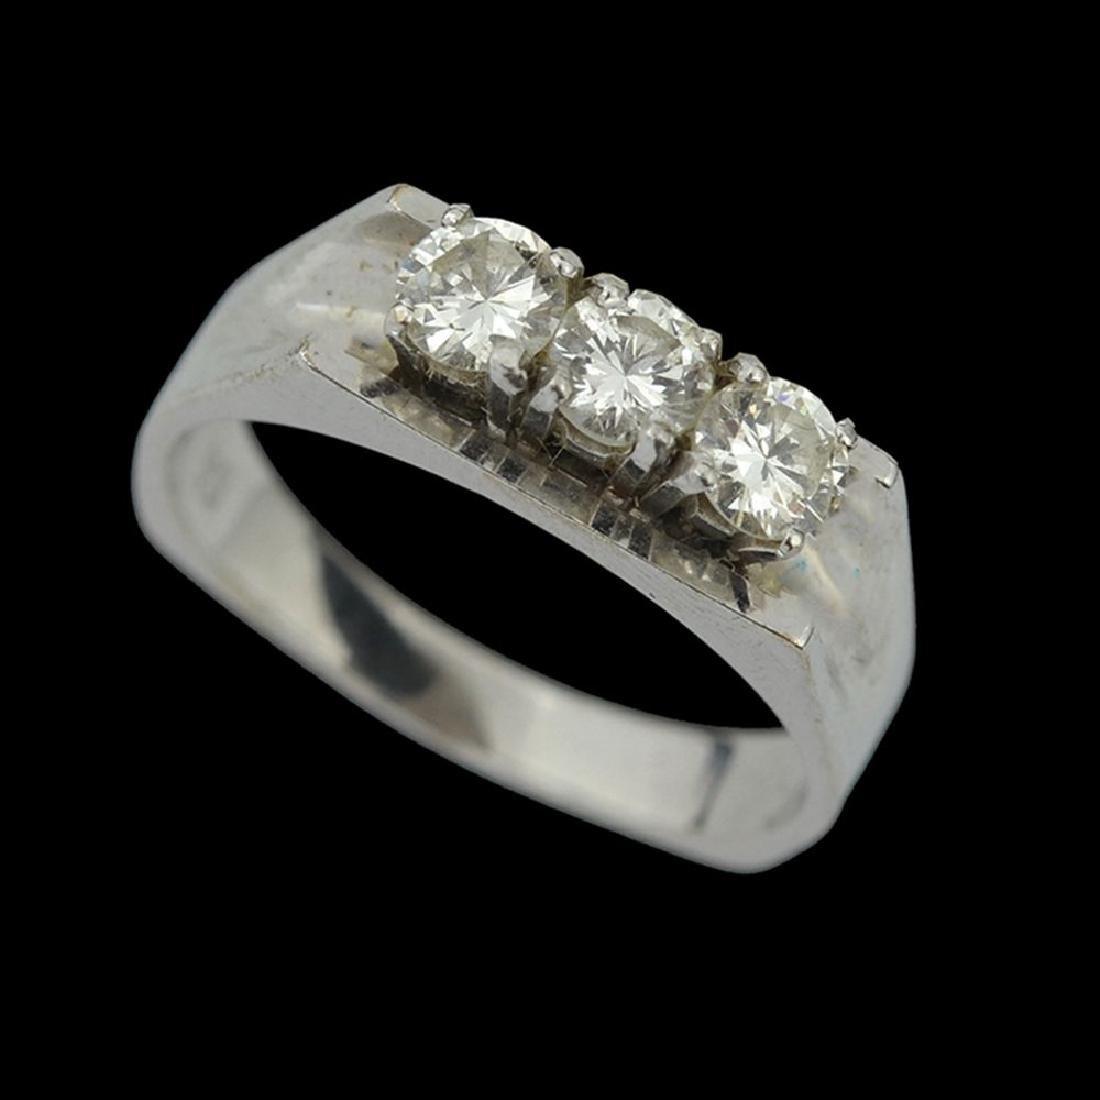 A 14K WHITE GOLD RING